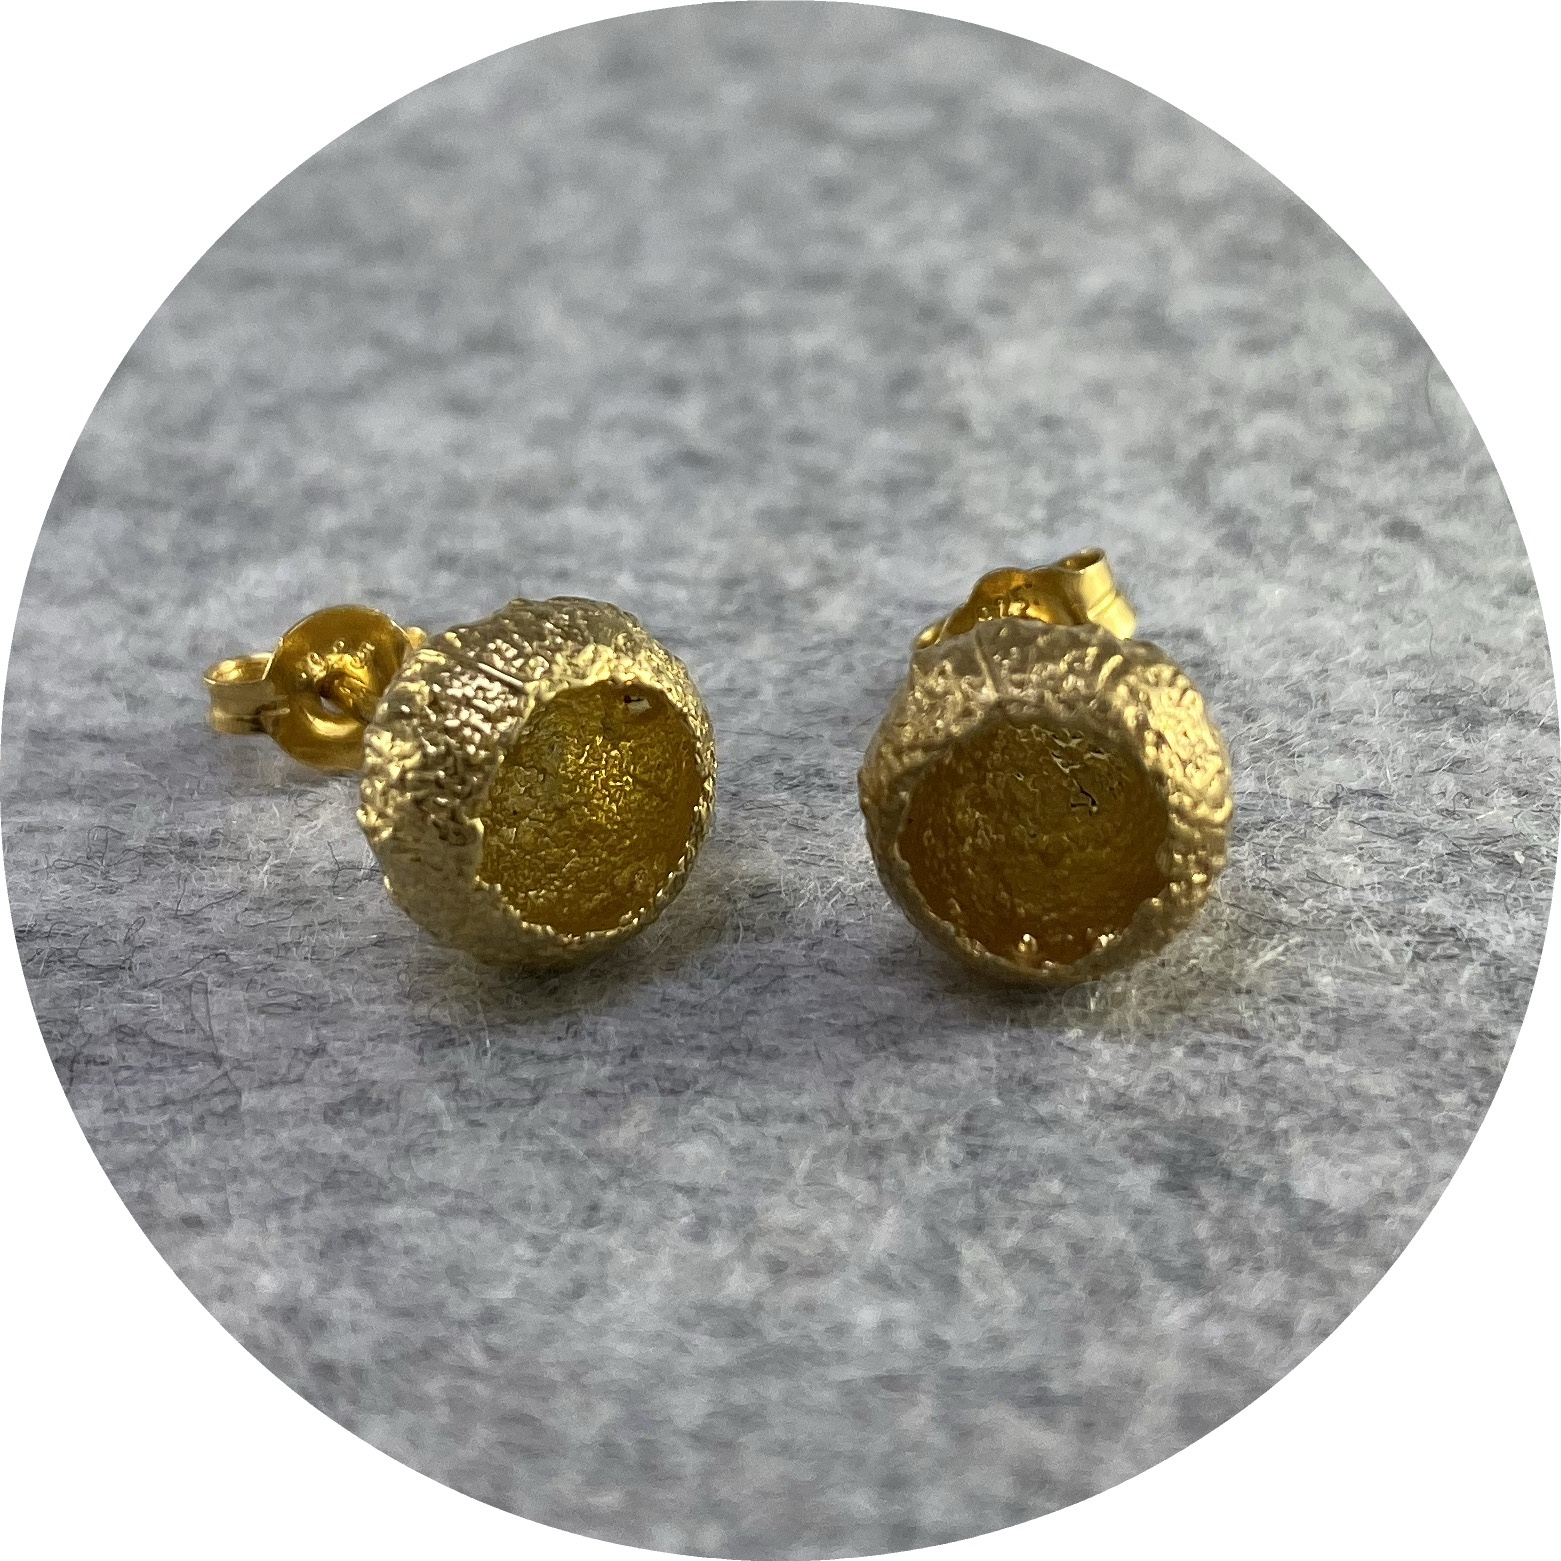 Manuela Igreja - 'Acorn Cap Studs', 925 silver, yellow gold plate